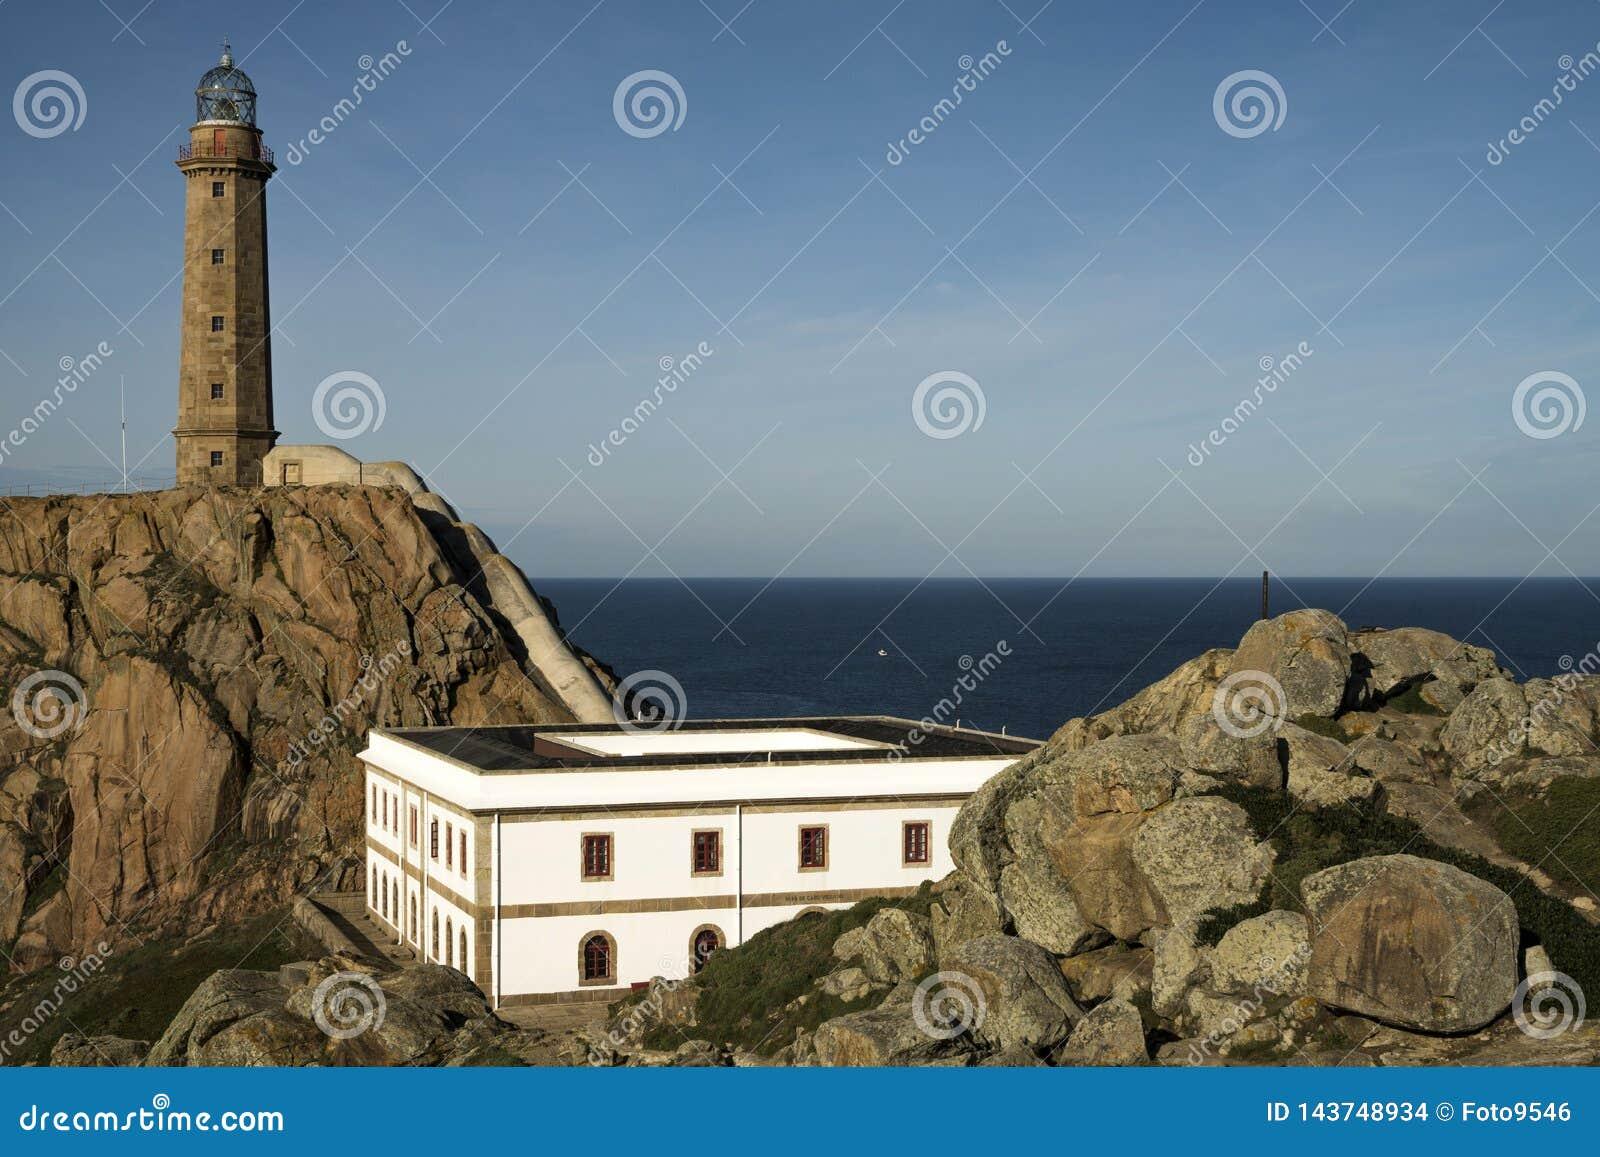 CAMARIÑAS, SPAIN - DECEMBER 17, 2016: view of the Vilán cape lighthouse in the Da Morte coast in Galicia, Spain